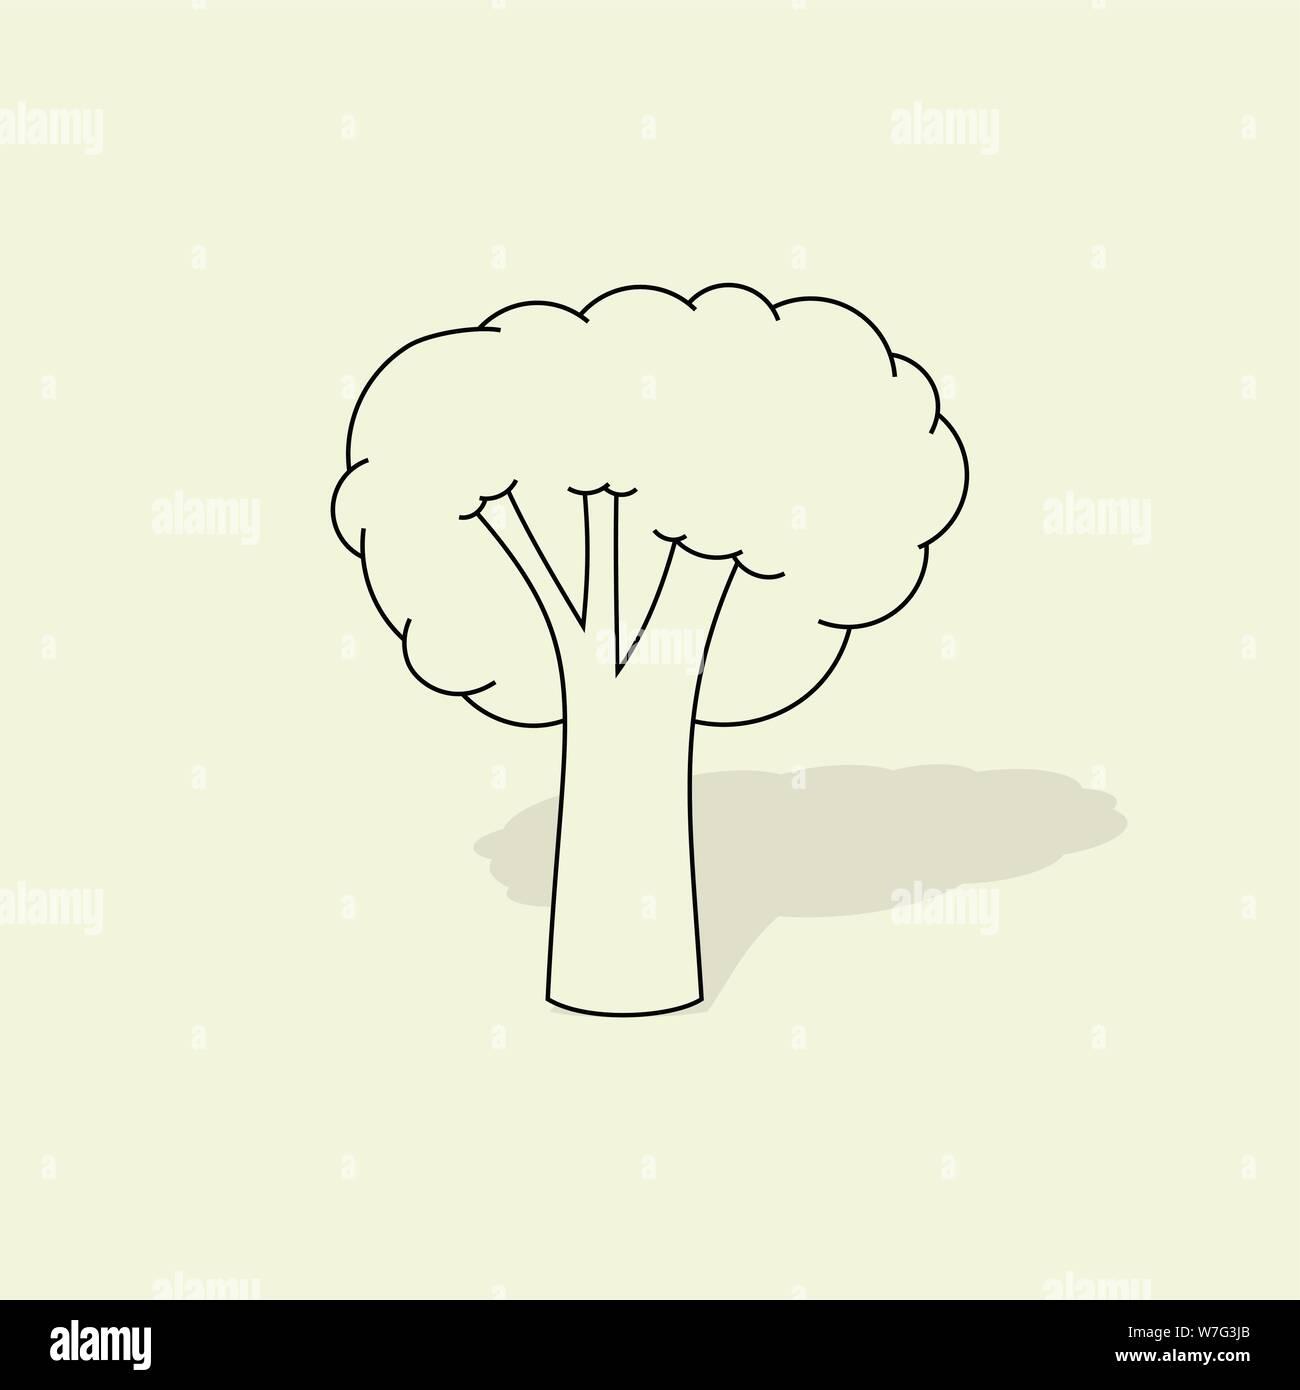 broccoli vector cartoon with black line no color concept design stock vector image art alamy https www alamy com broccoli vector cartoon with black line no color concept design image262812211 html